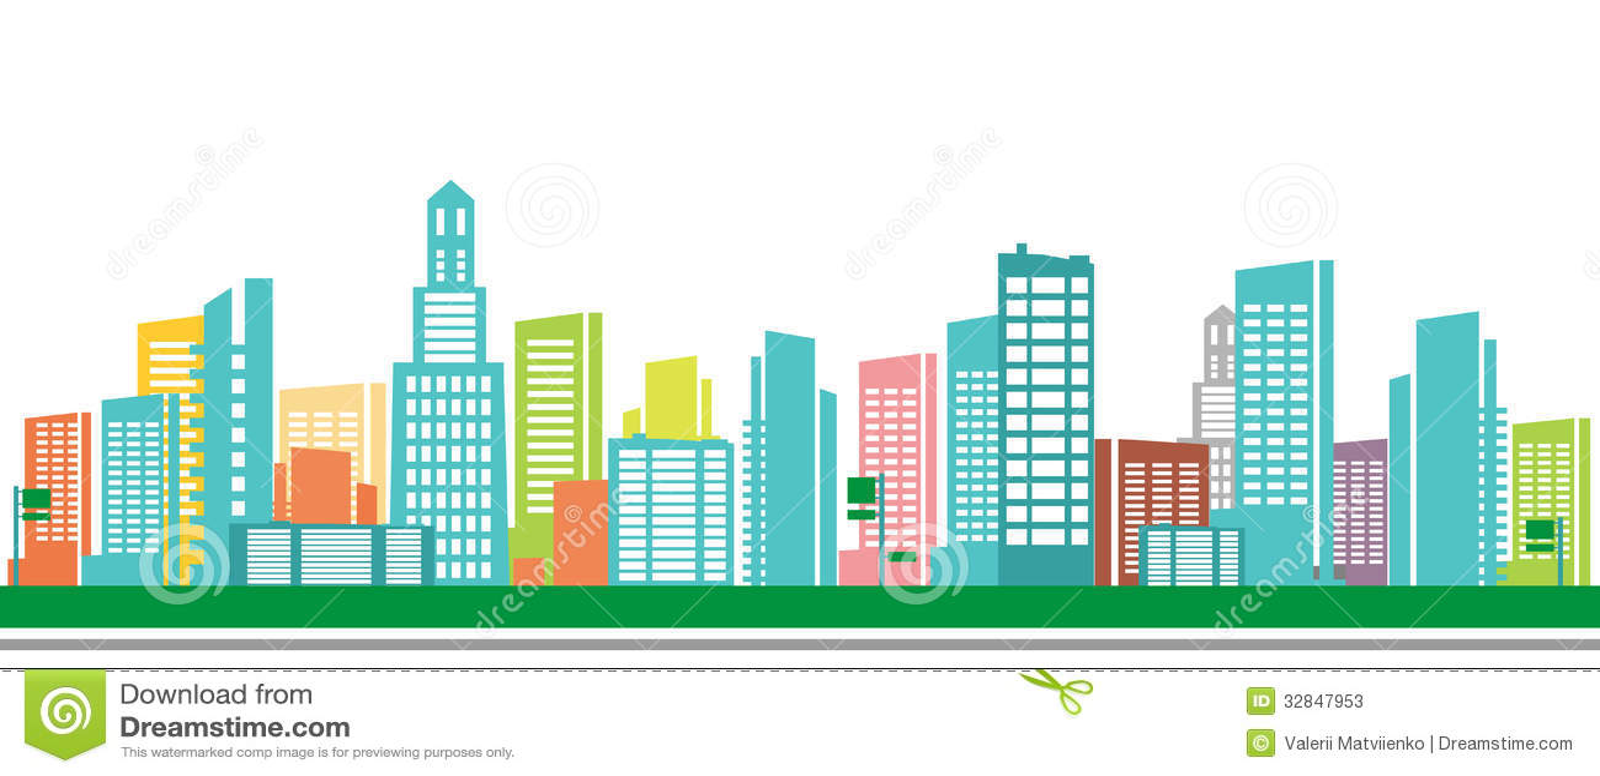 Panorama Town - Sketch Illustration Stock Photos - Image: 32847953 Superhero Flying Vector